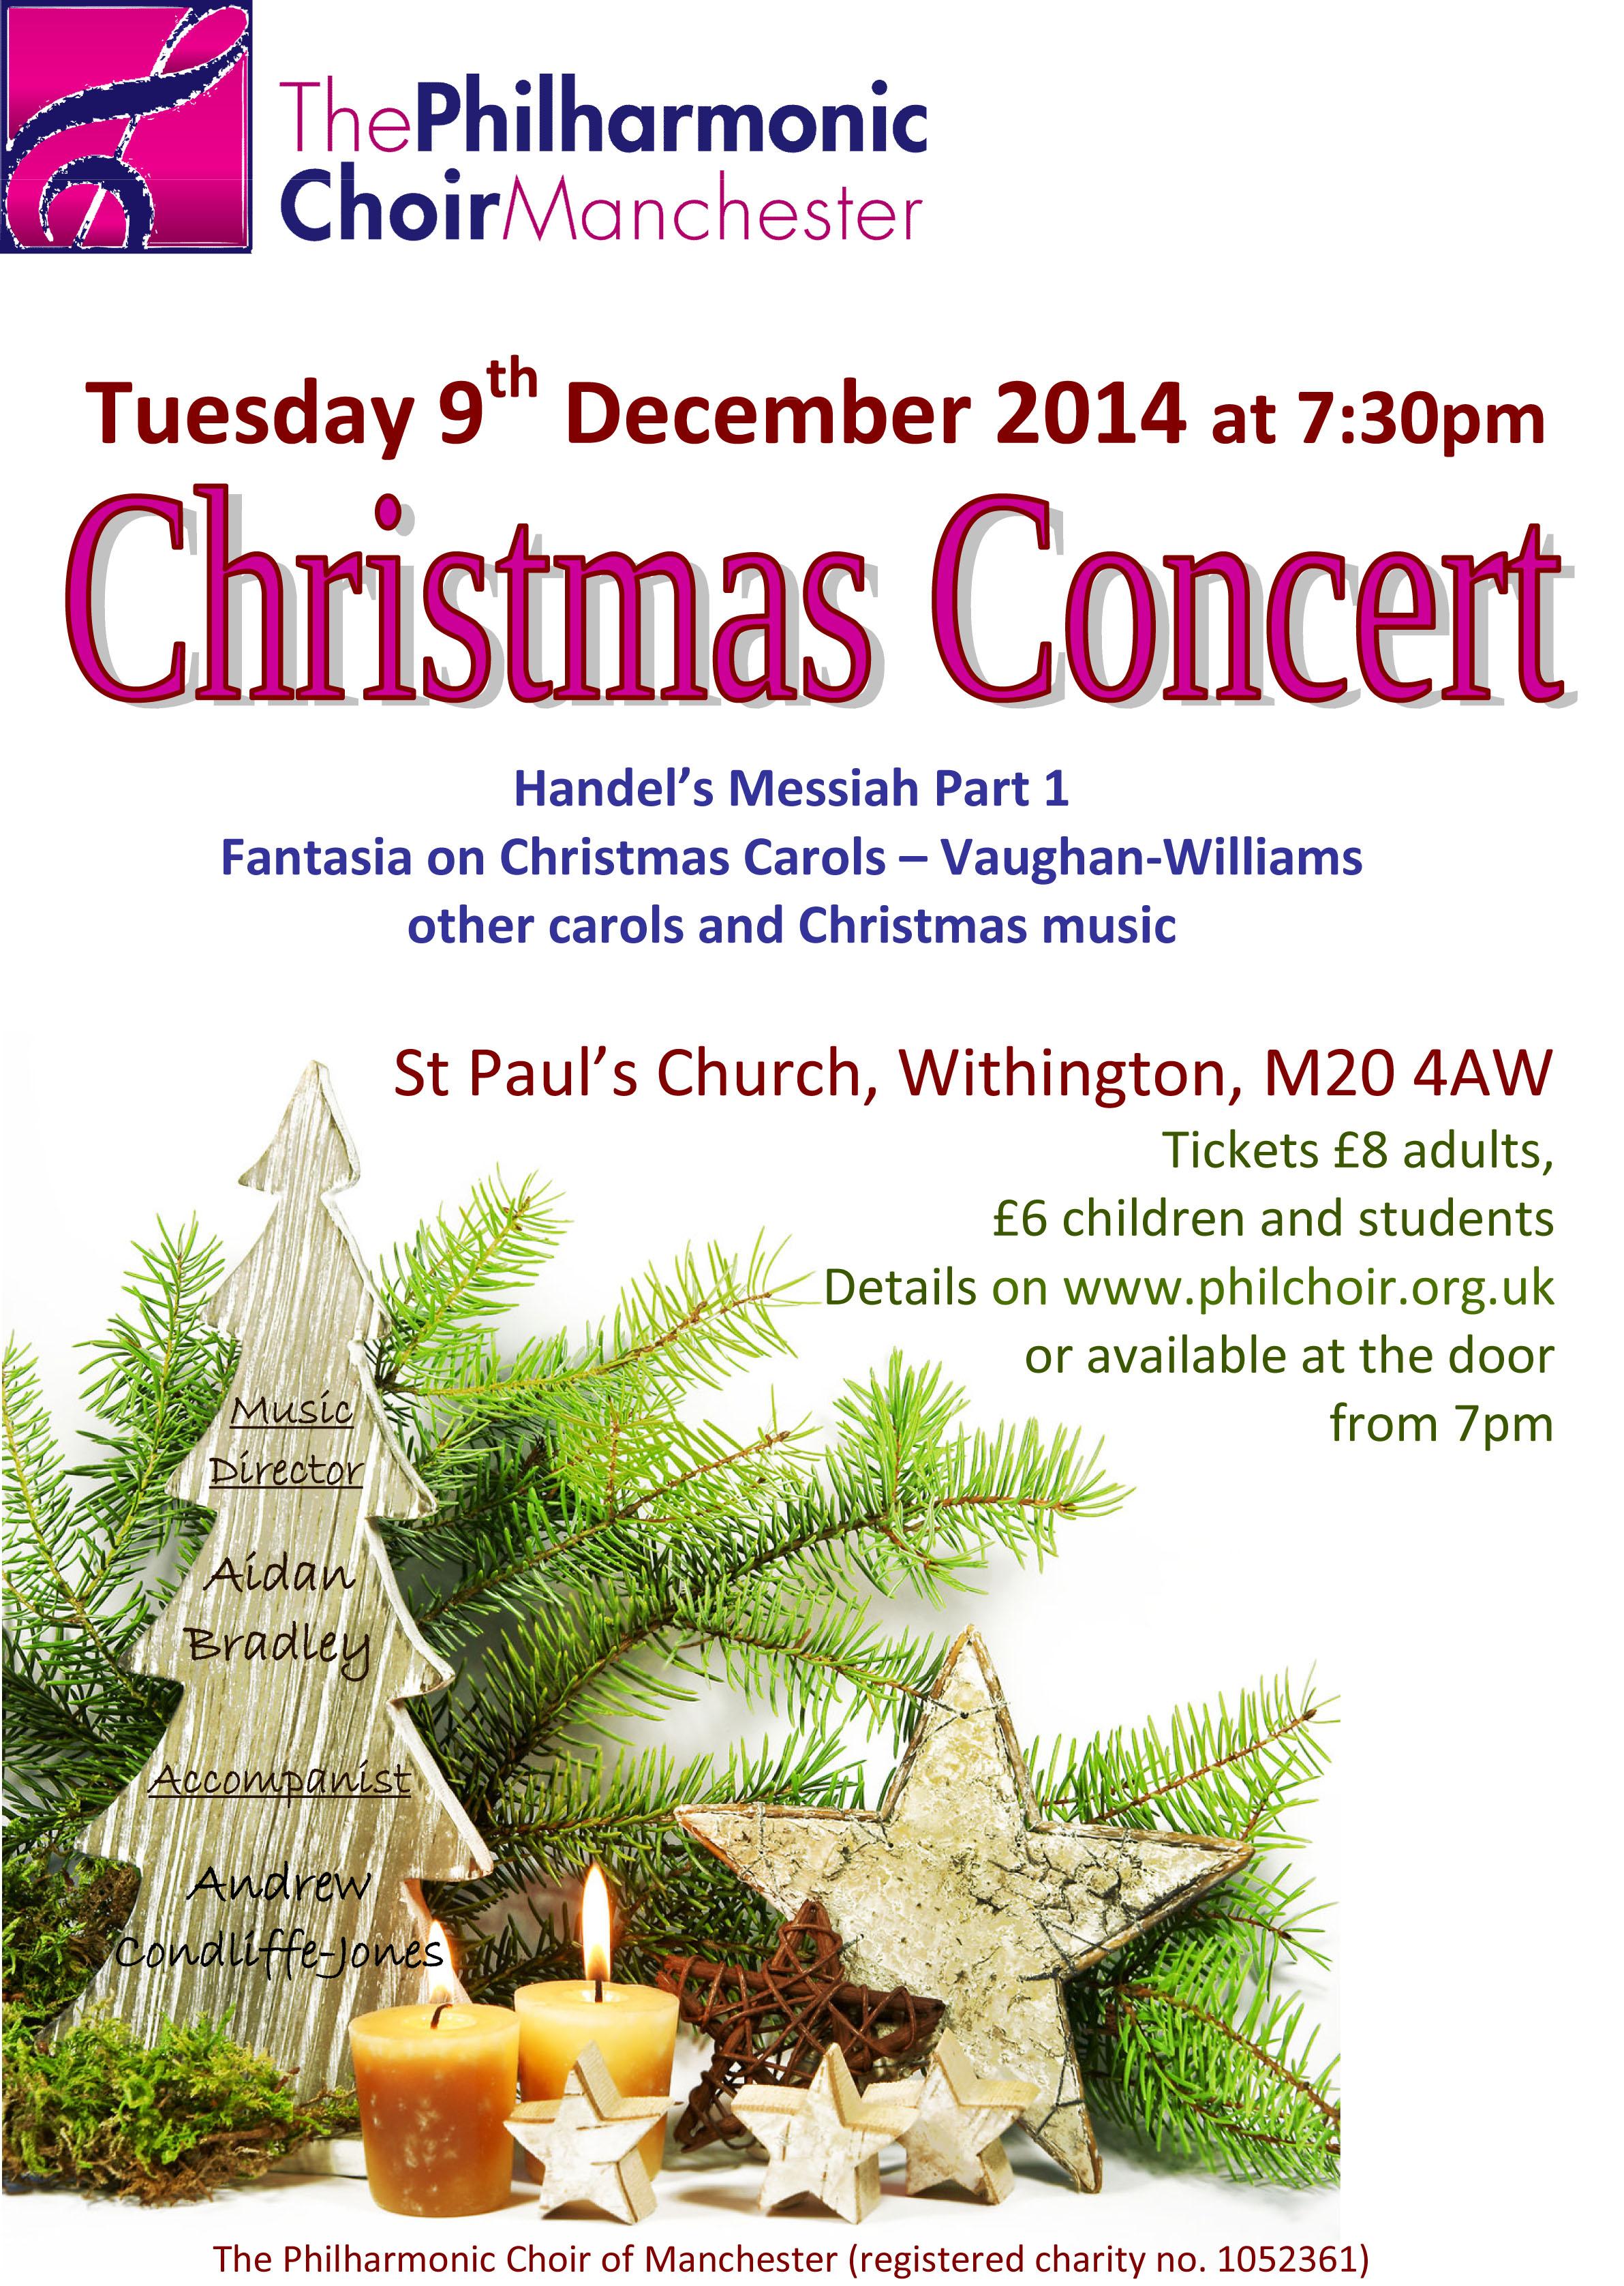 Microsoft Word - Choir Poster Christmas Dec 2014.doc